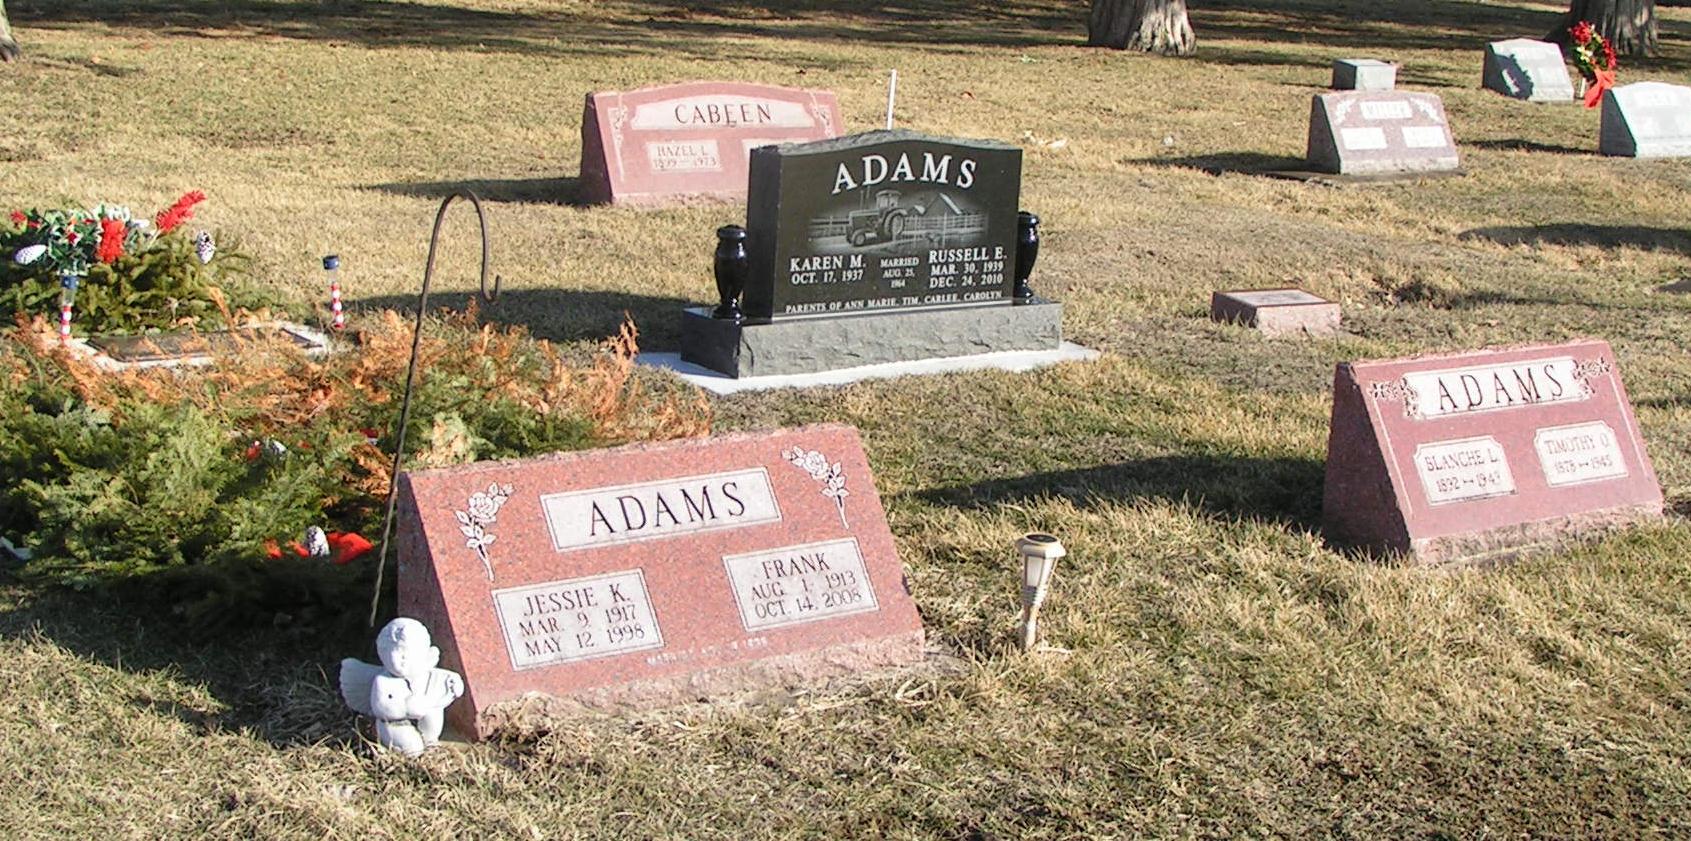 James E Jimmy Adams